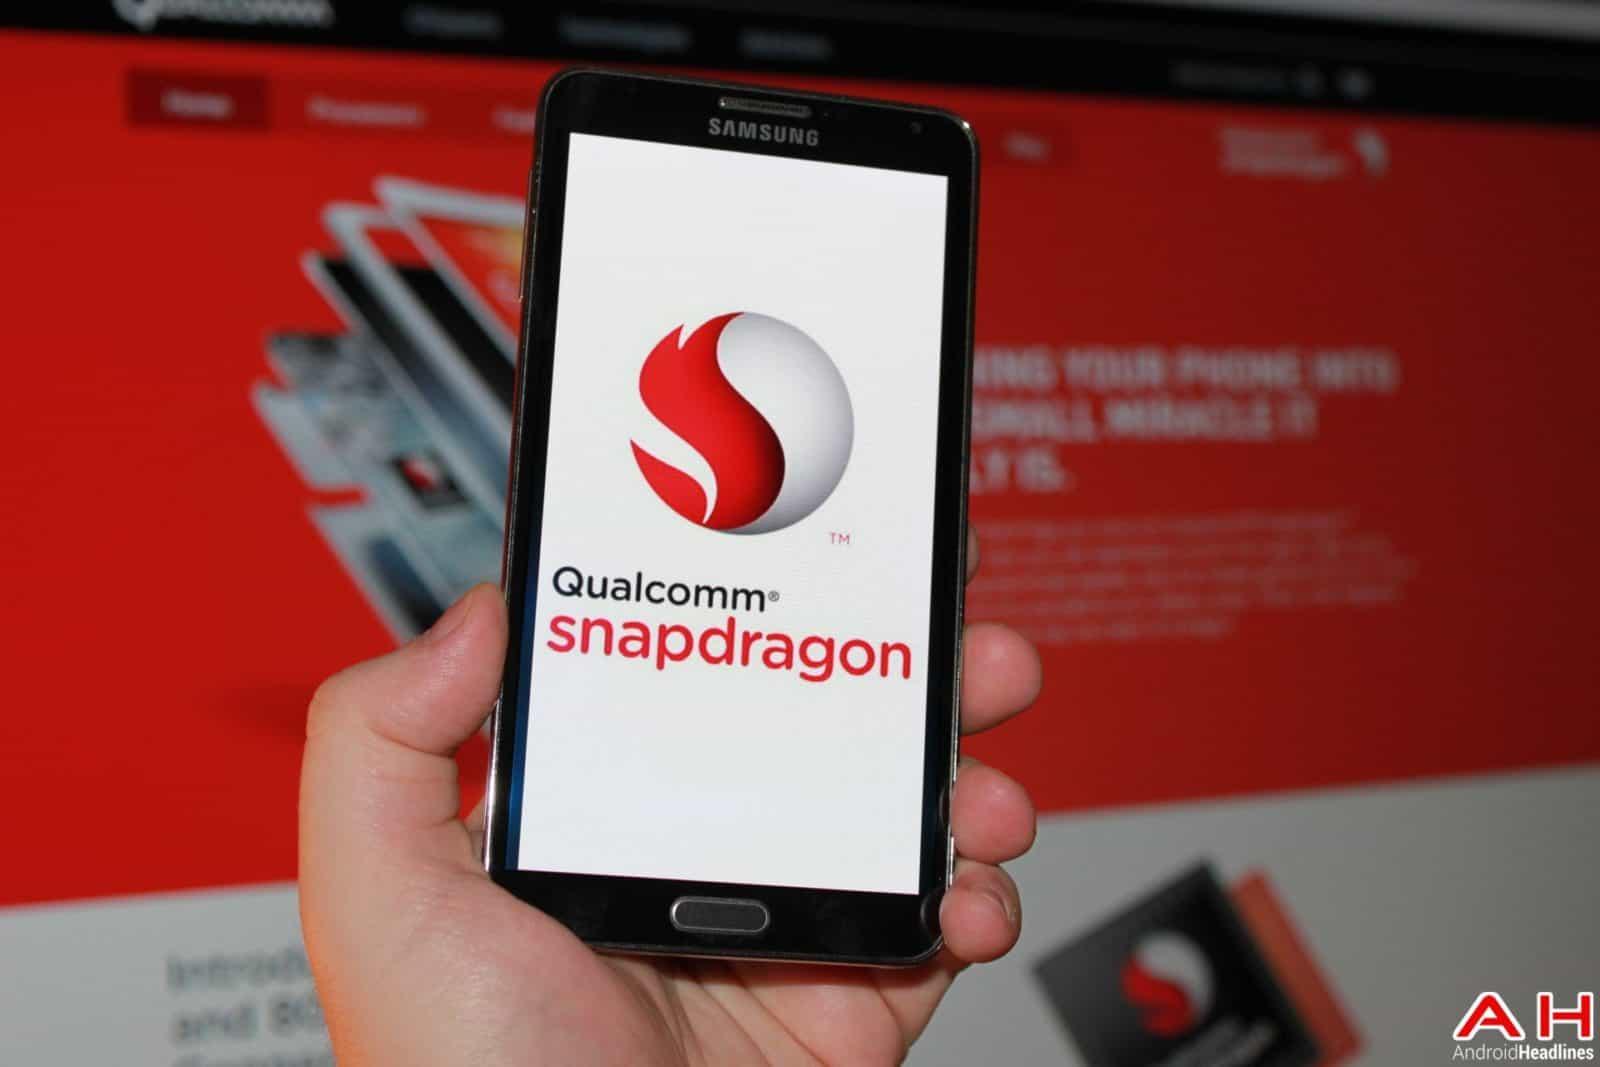 AH SnapDragon Qualcomm 2.2